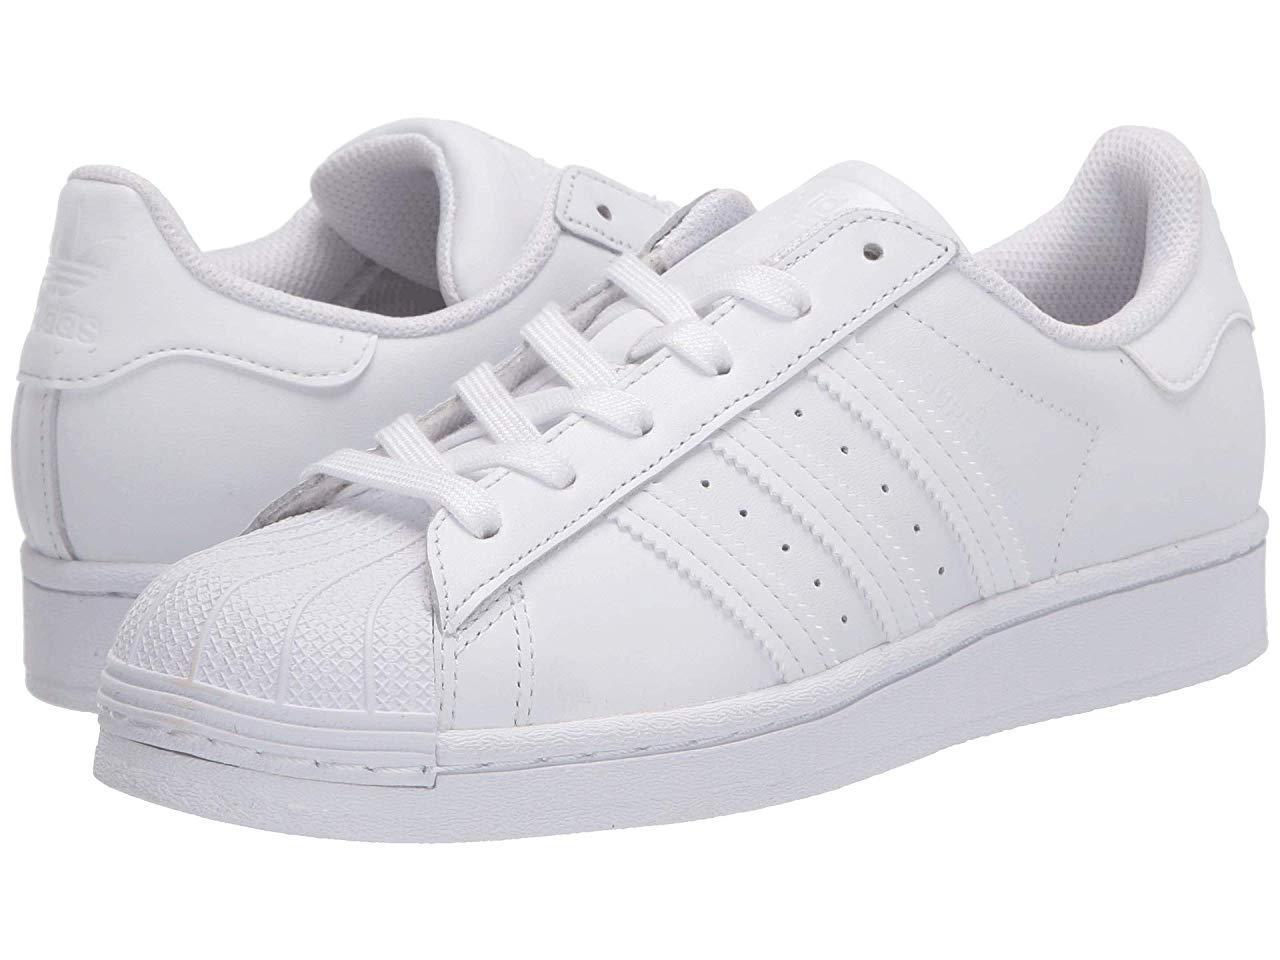 Кроссовки/Кеды adidas Originals Superstar W Footwear White/Footwear White/Footwear White